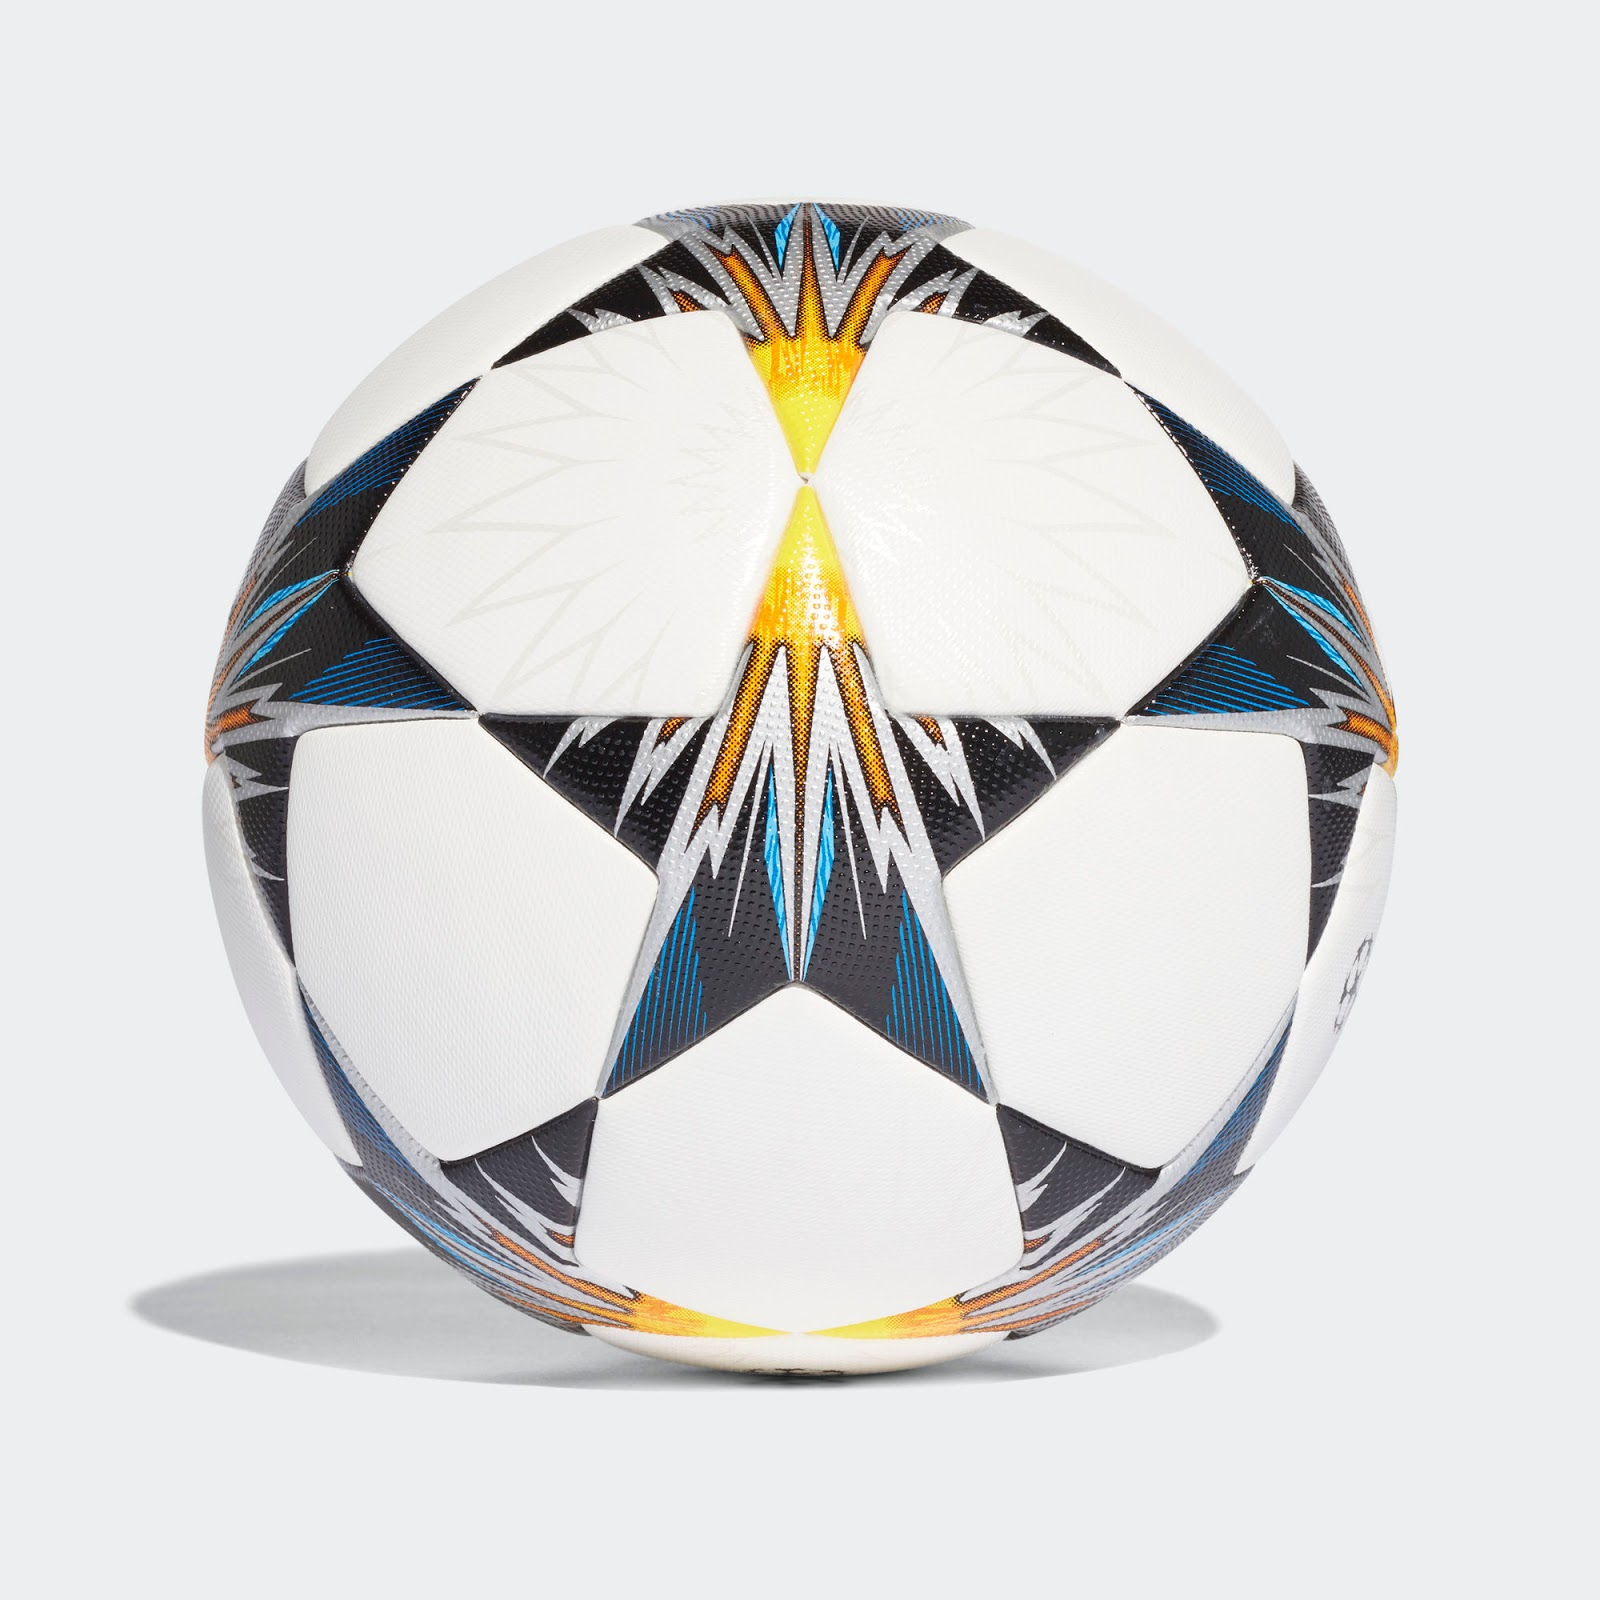 Adidas 2018 Champions League Final Kiev Ball Released ...